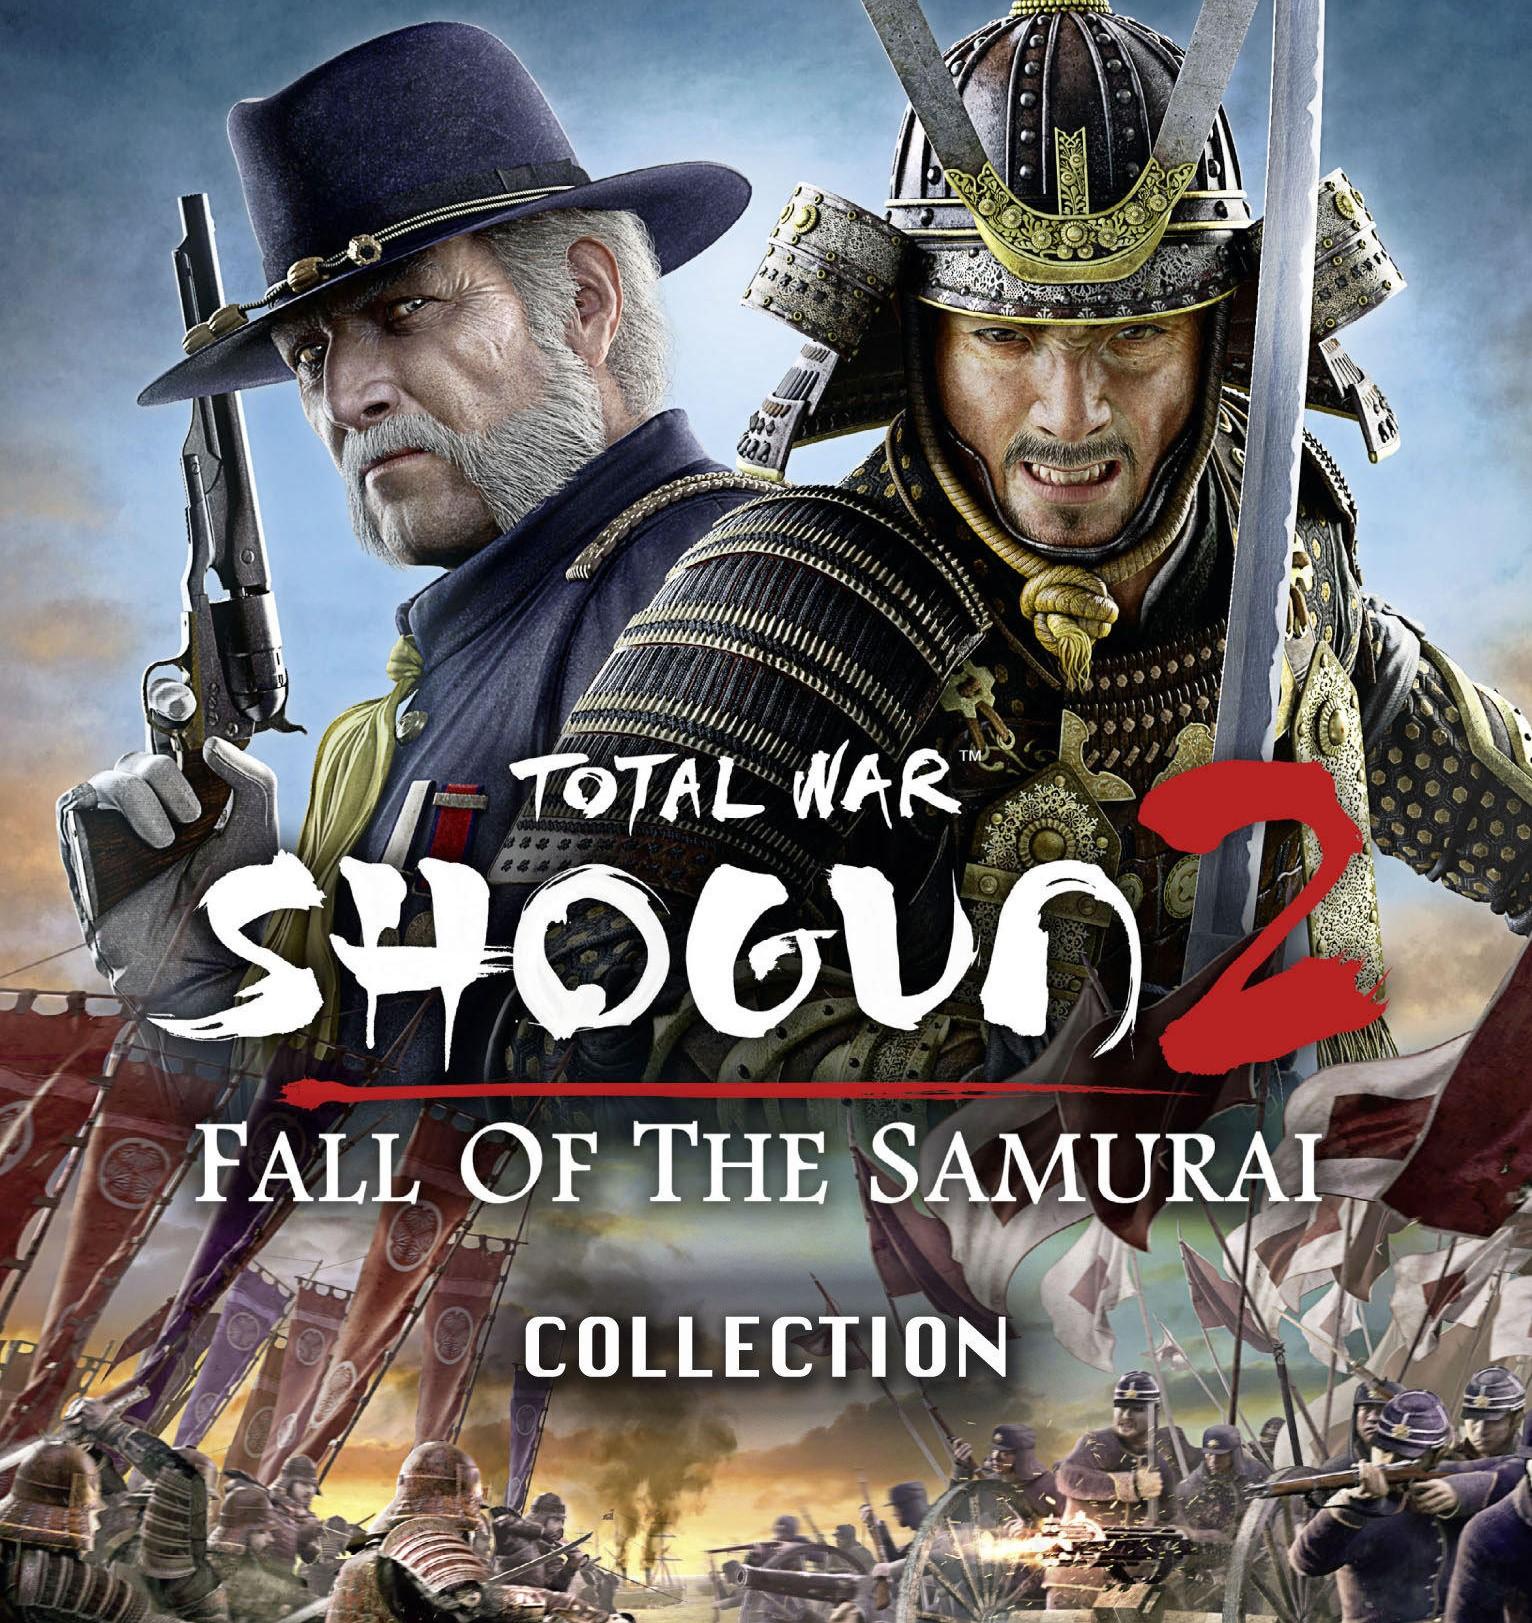 total war shogun 2 collection - 3